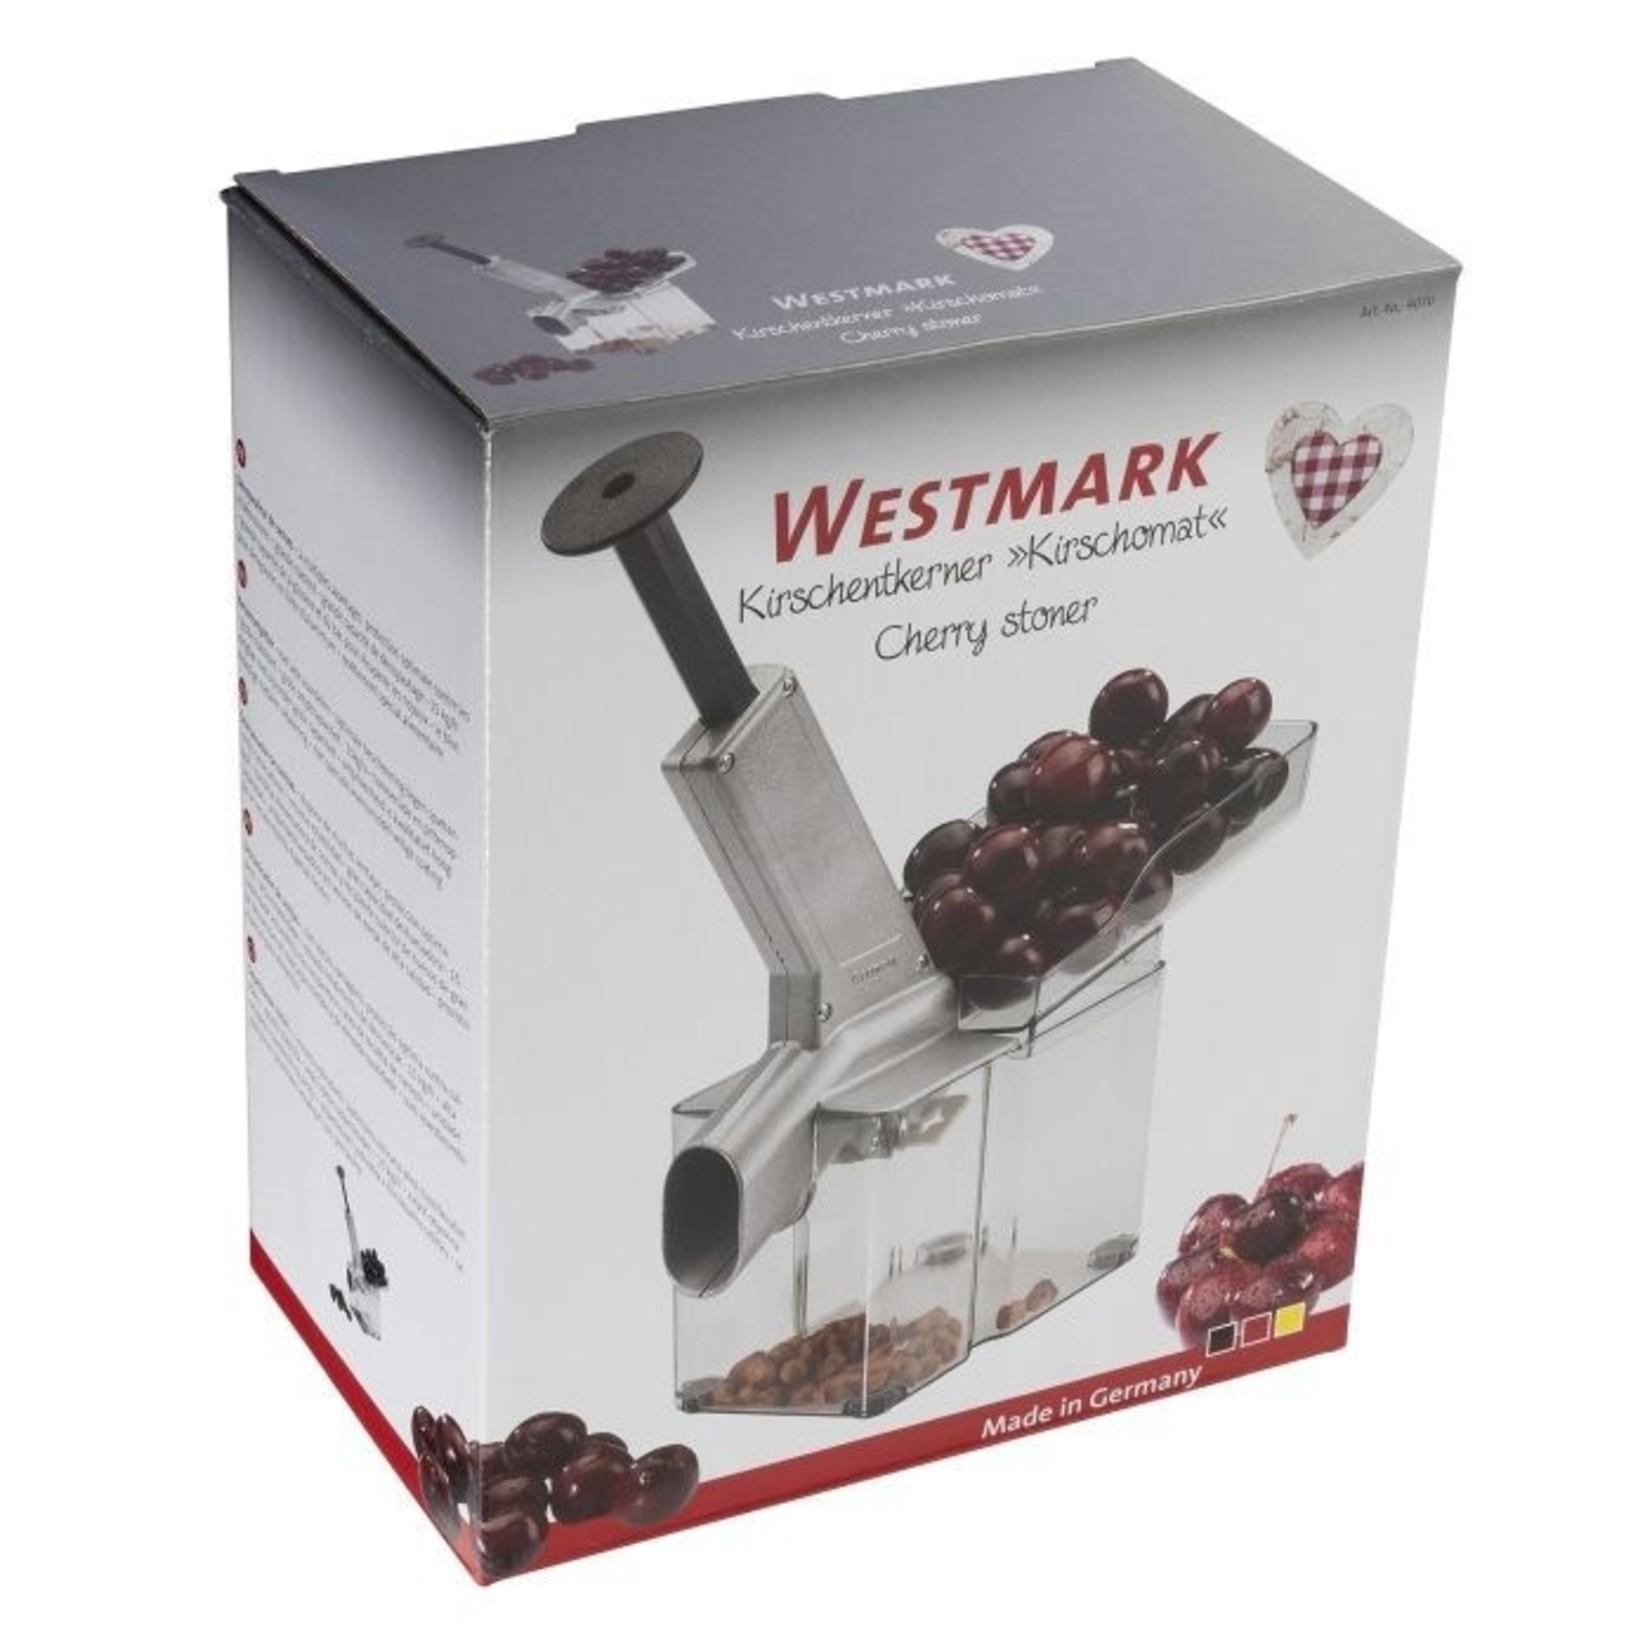 Westmark Cherry Stoner